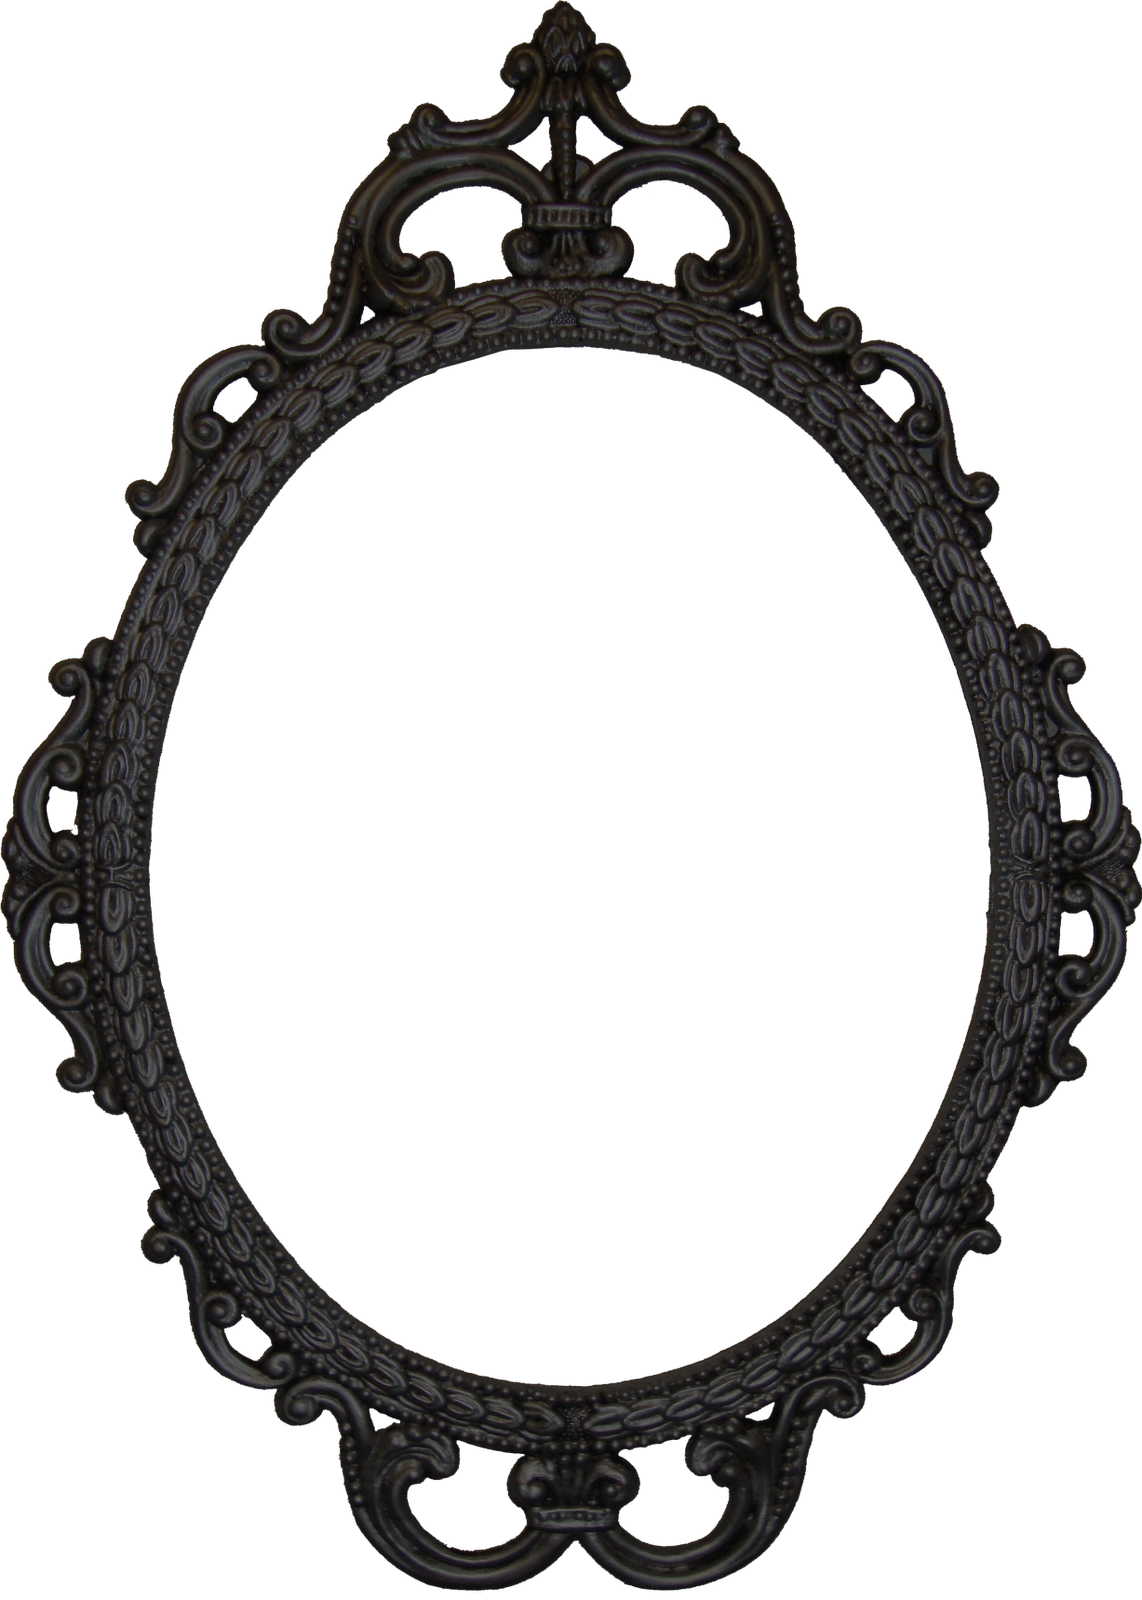 FREE Digital Antique Photo Frames! | Antique photo frames ...